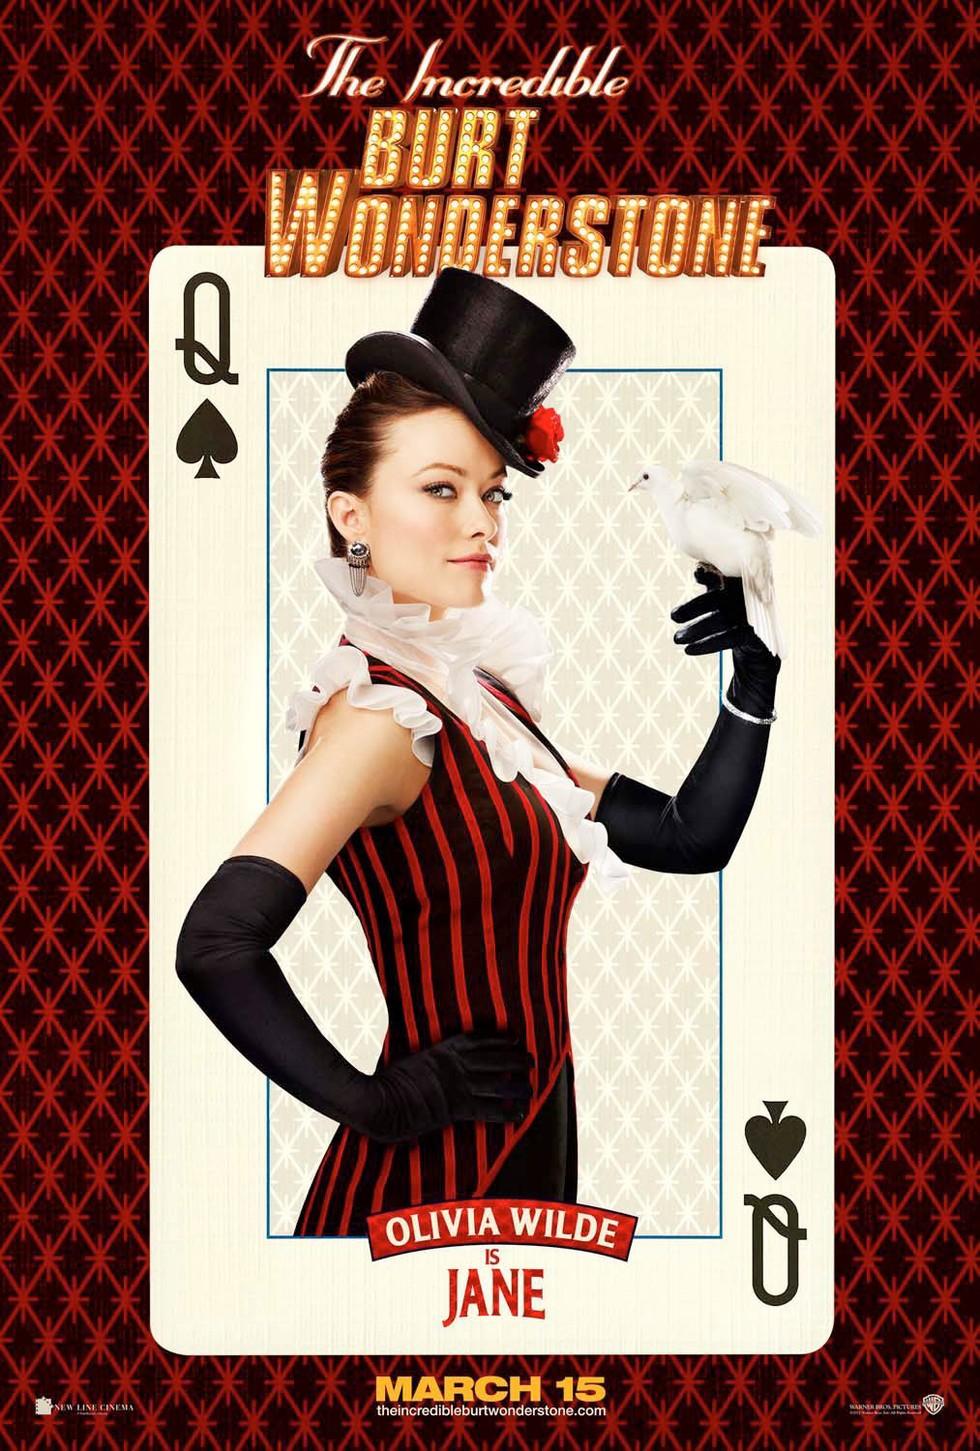 The Incredible Burt Wonderstone - Movie Poster #8 (Large)